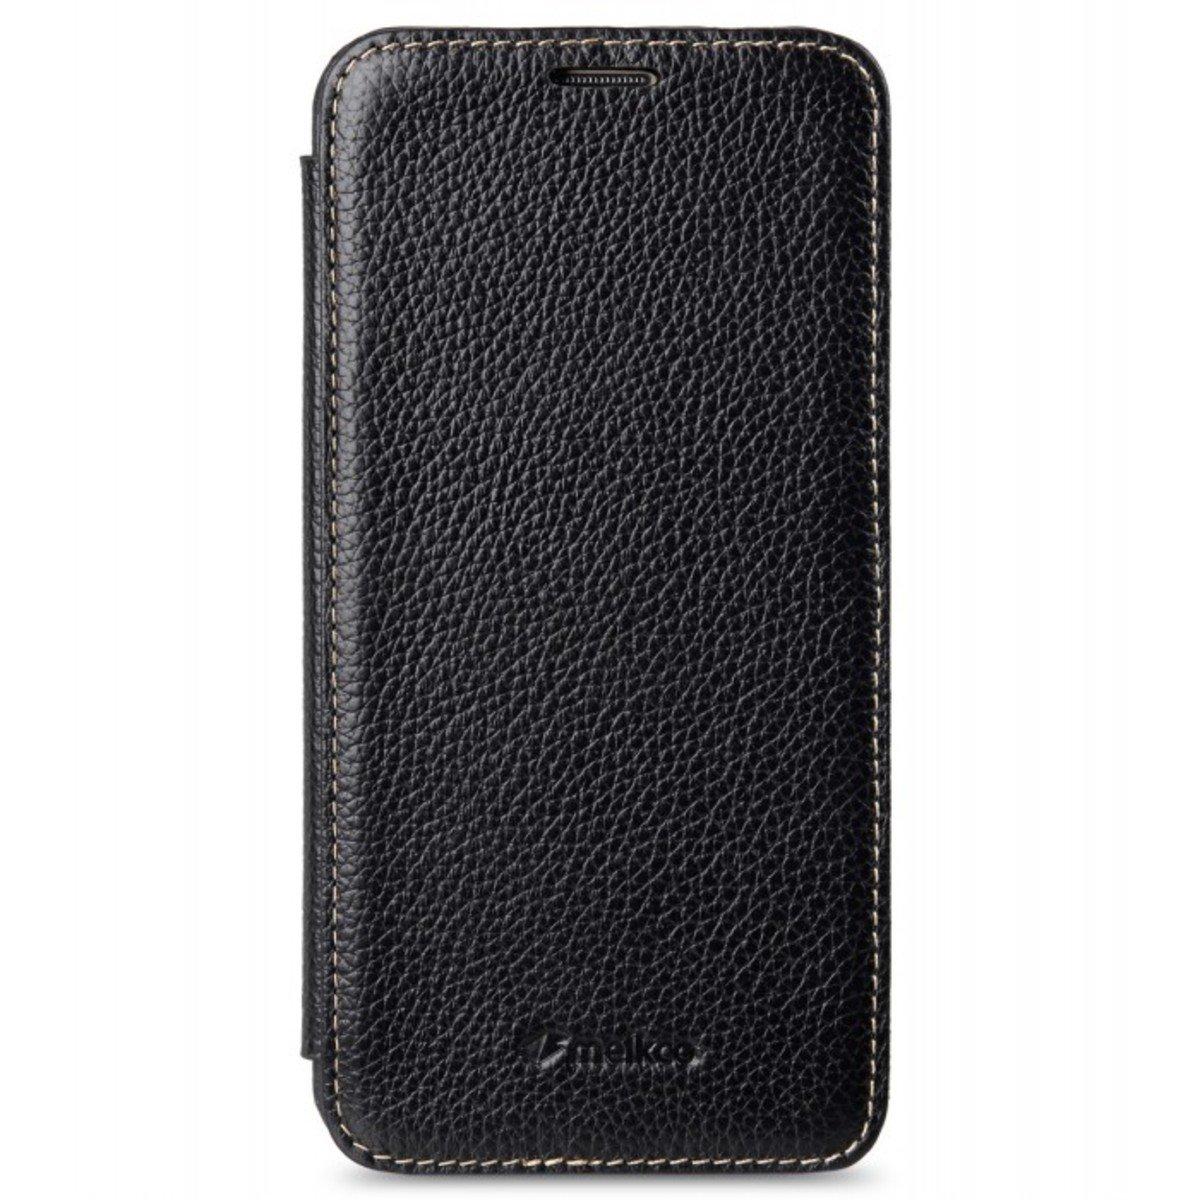 Samsung Galaxy A8 Face Cover Book Type 高級真皮革手機套 - 黑色荔枝紋